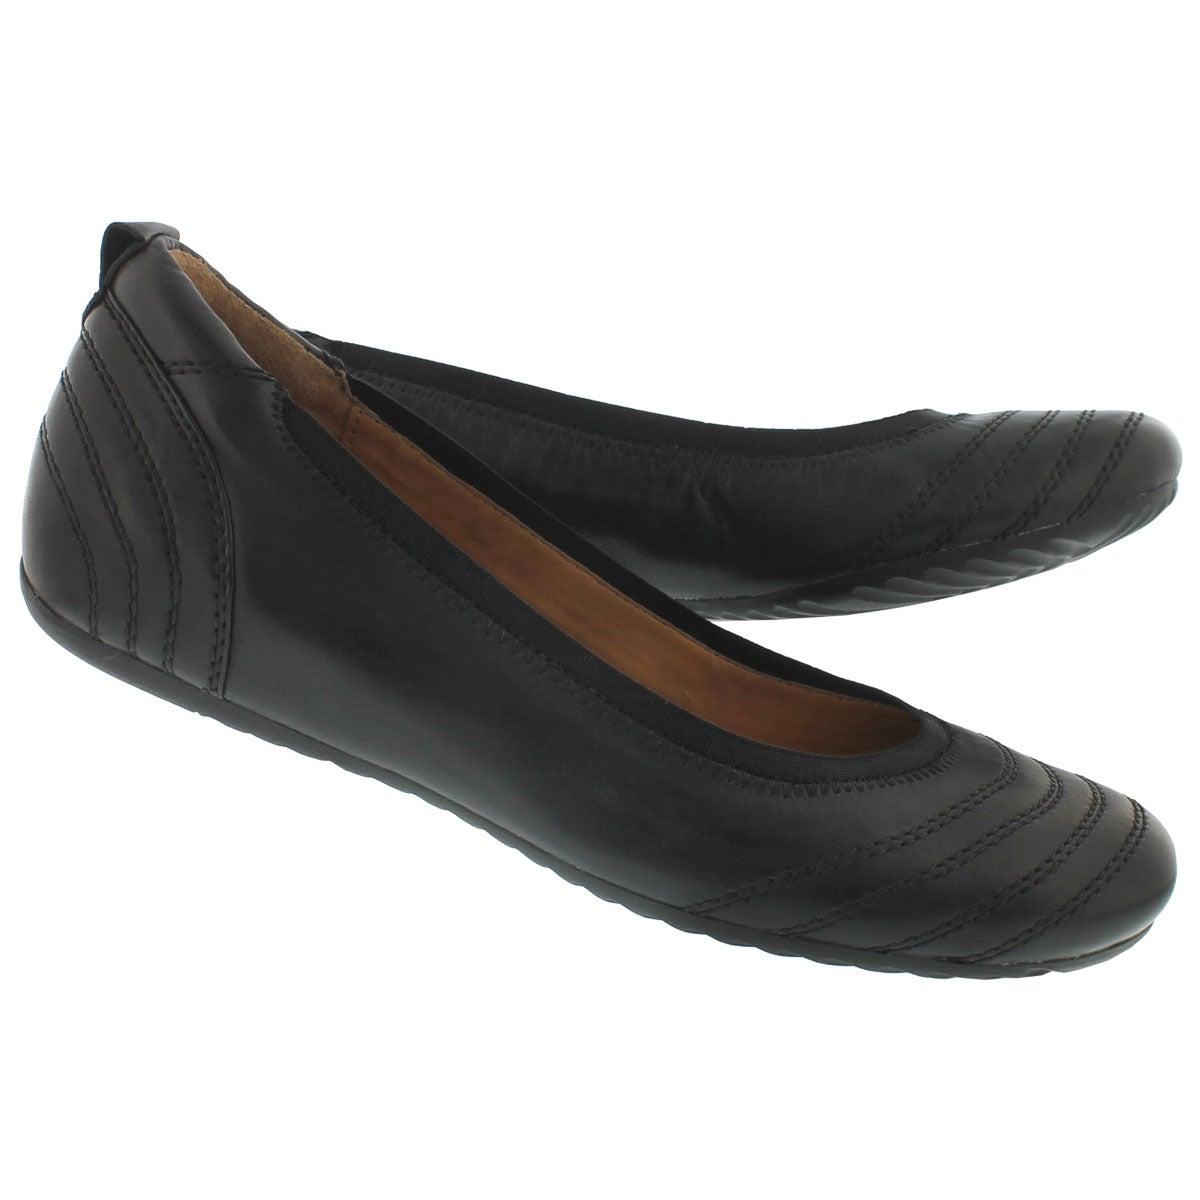 Lds Dasha black ballerina flat- wide